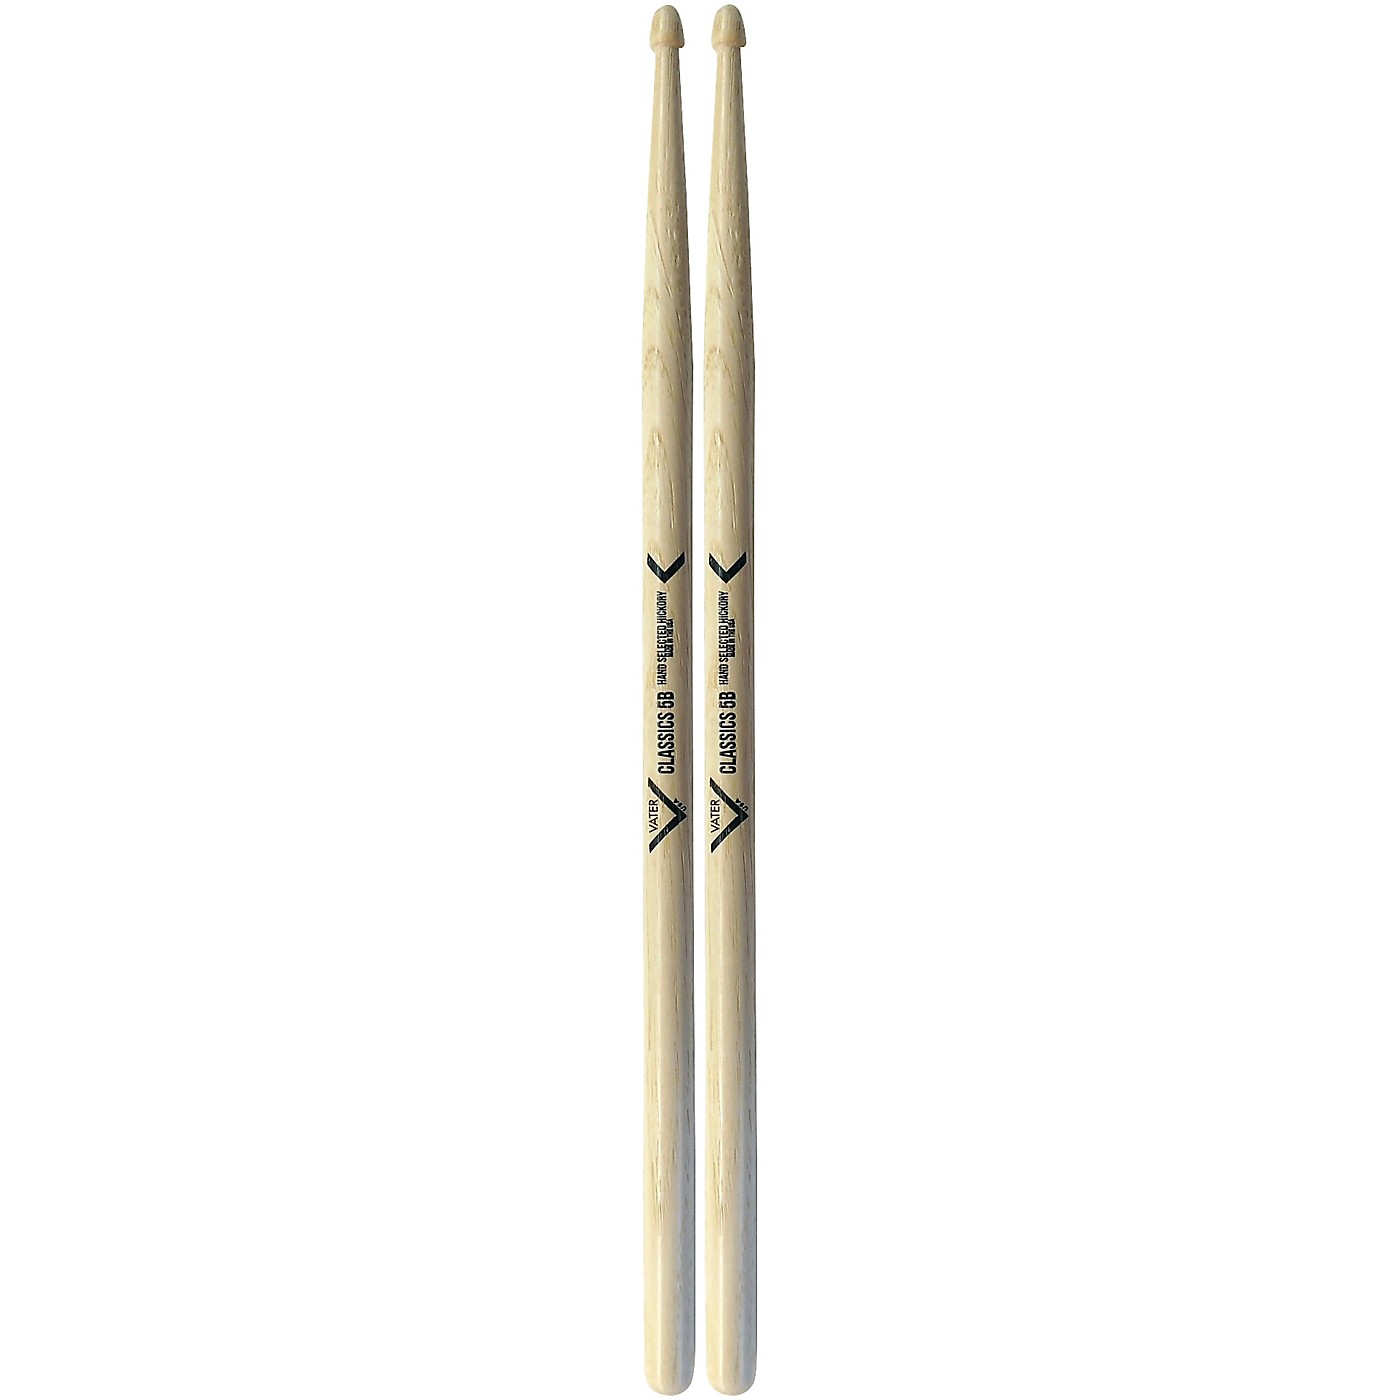 Vater Classics Series Drum Sticks thumbnail